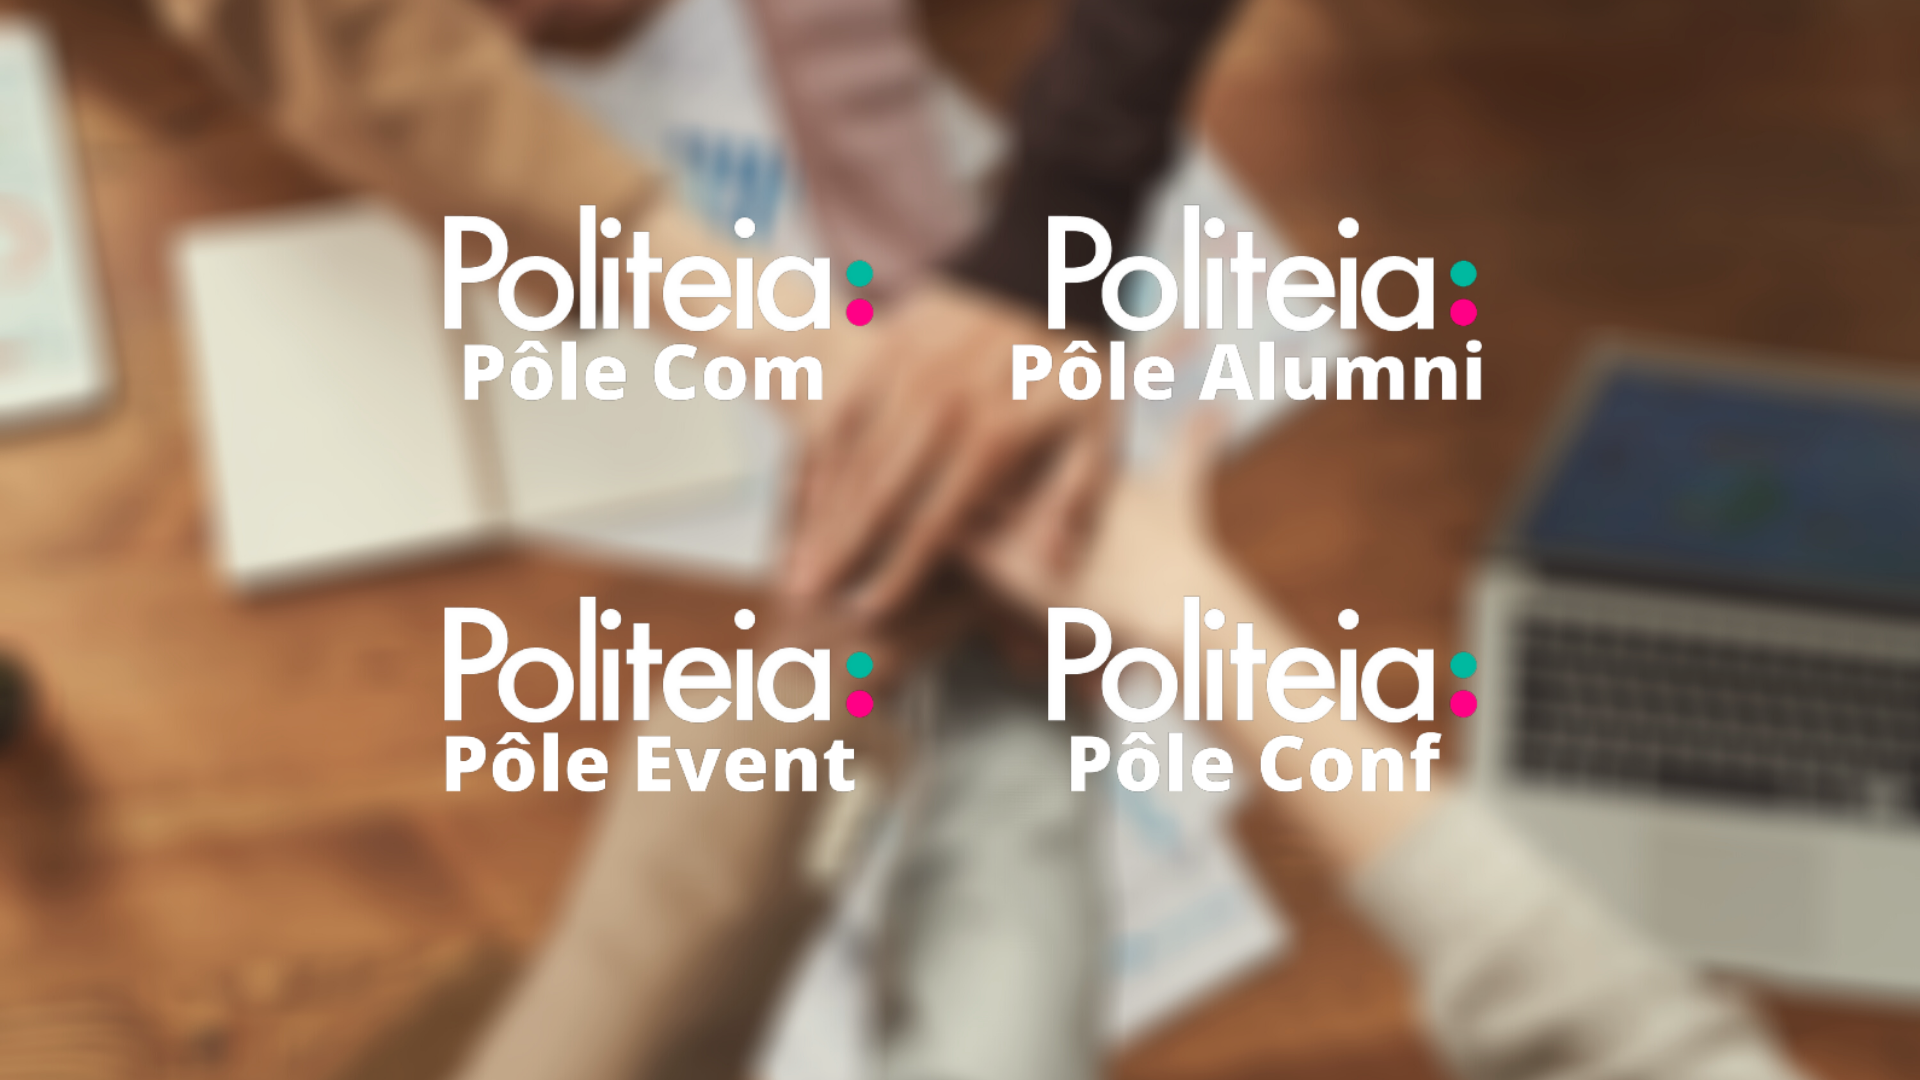 https://politeia-ices.fr/wp-content/uploads/2020/09/poles-politeia.png